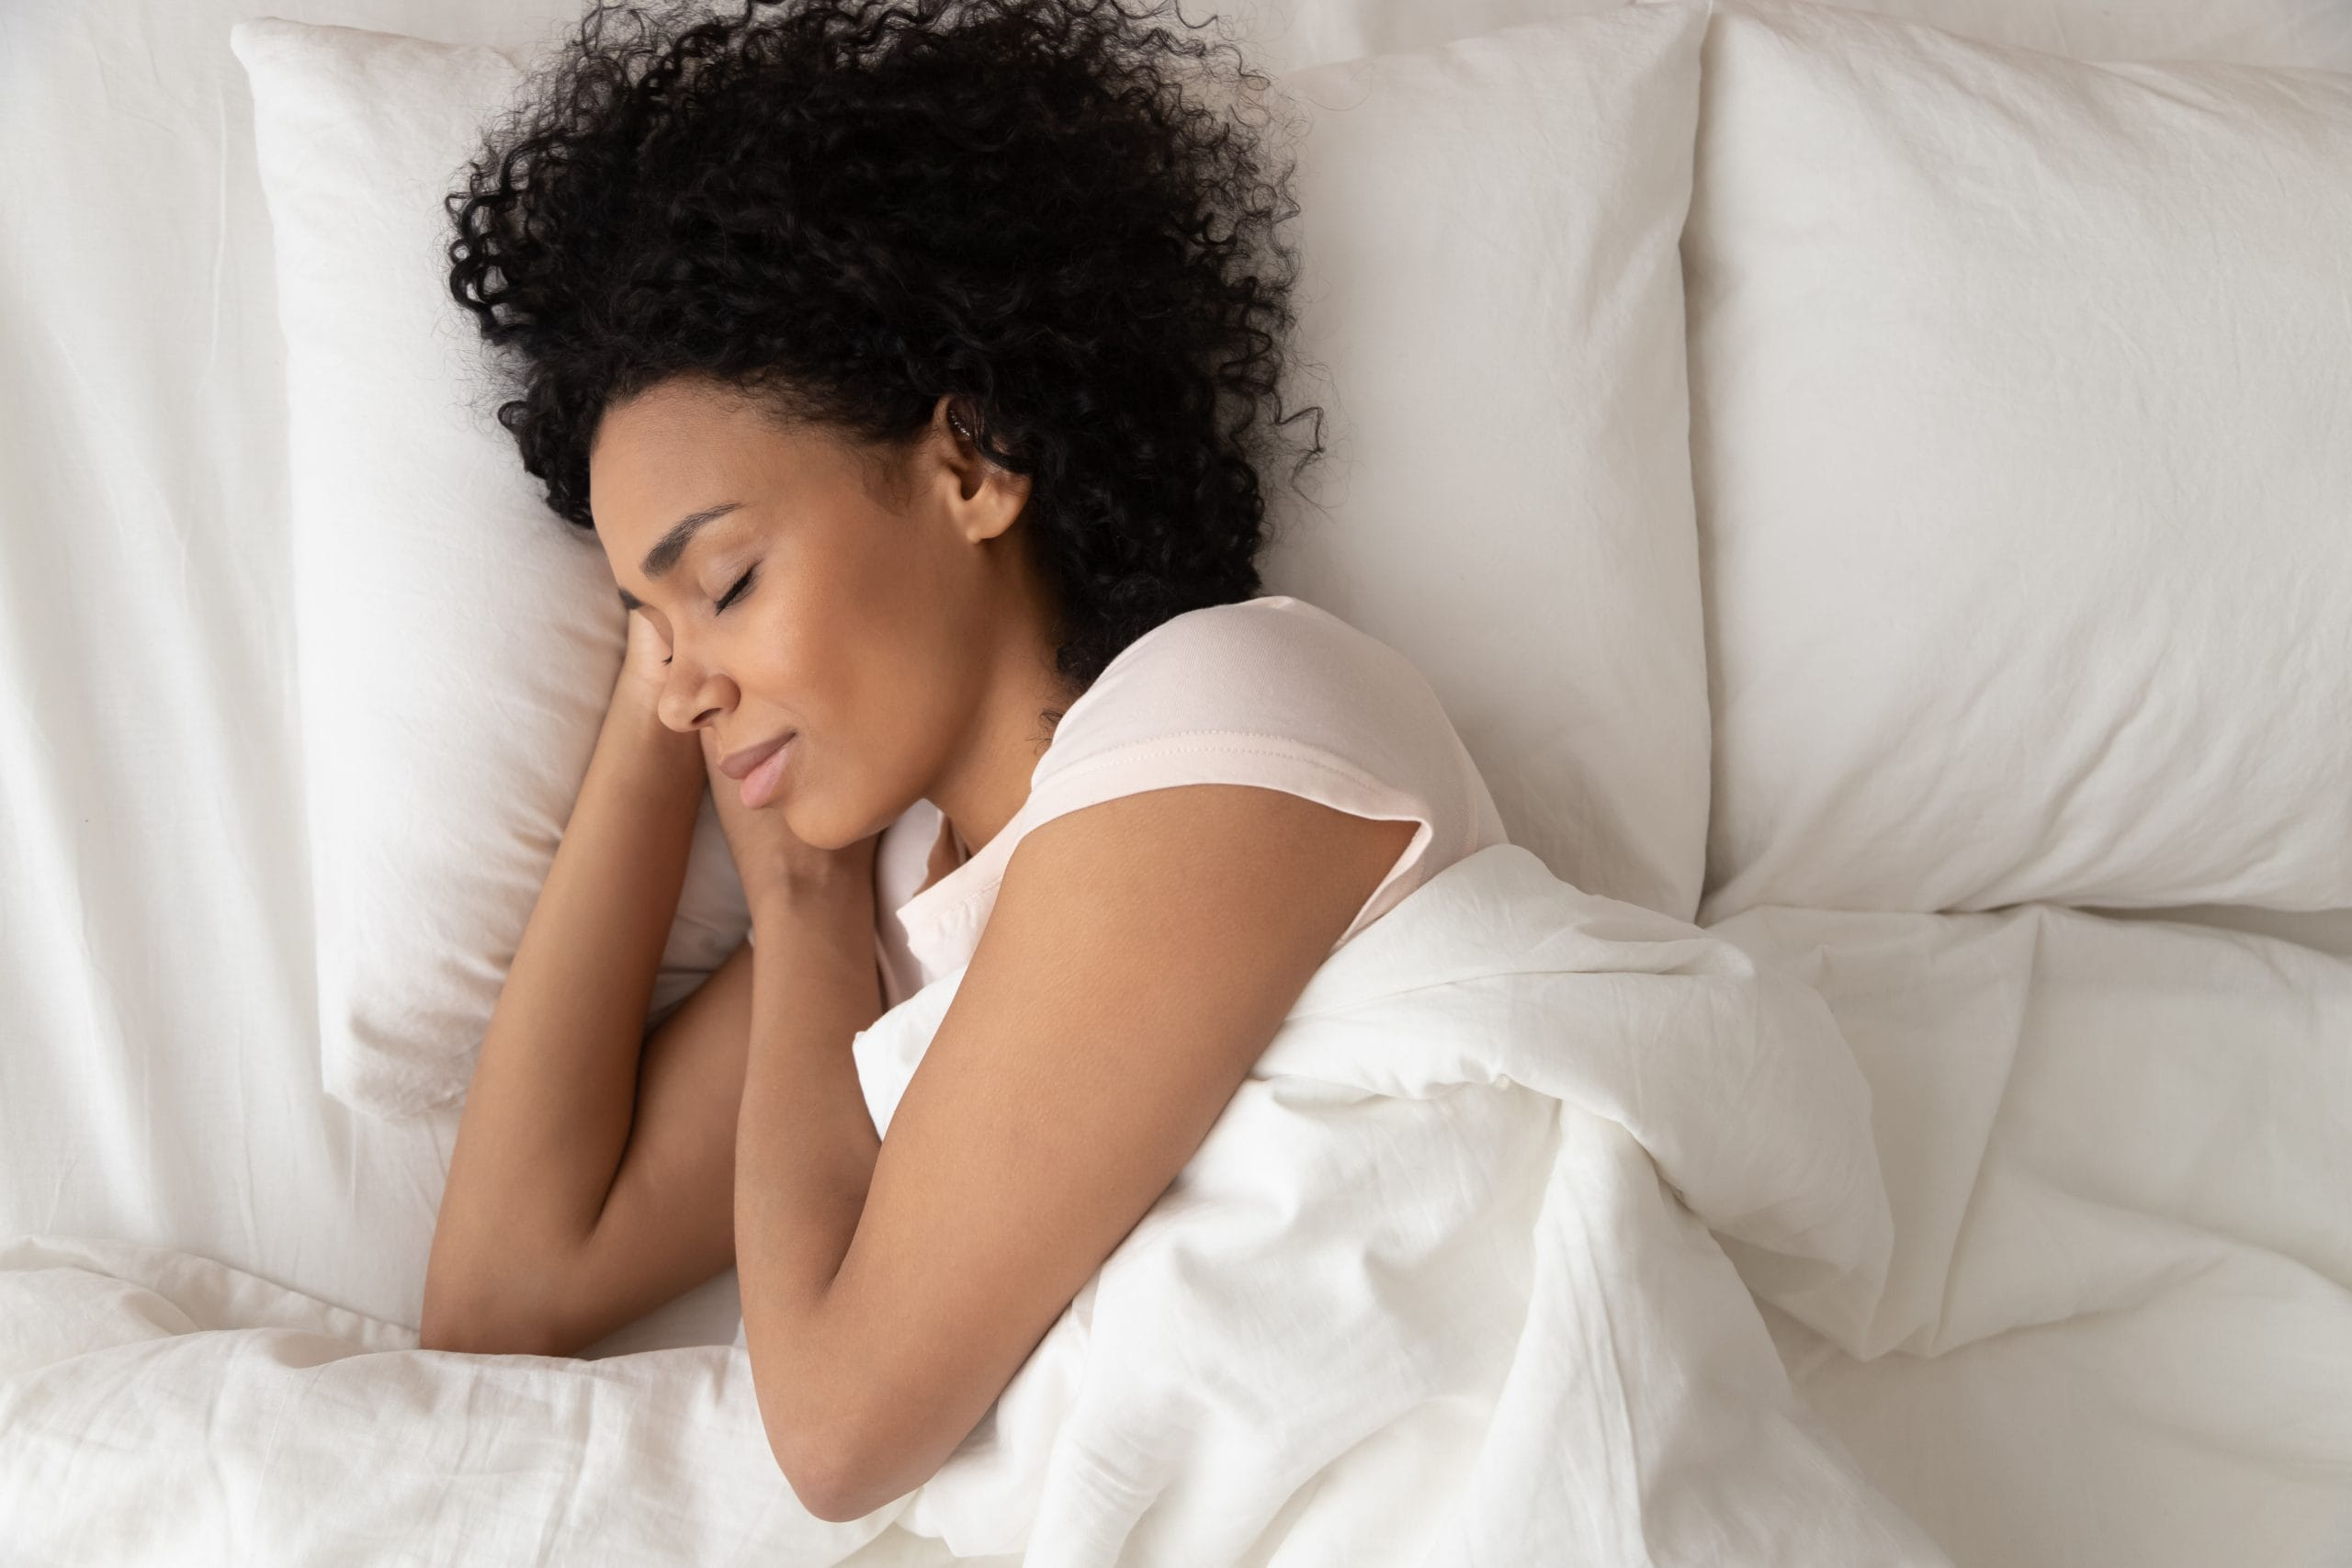 CBD helps with sleep and insomnia